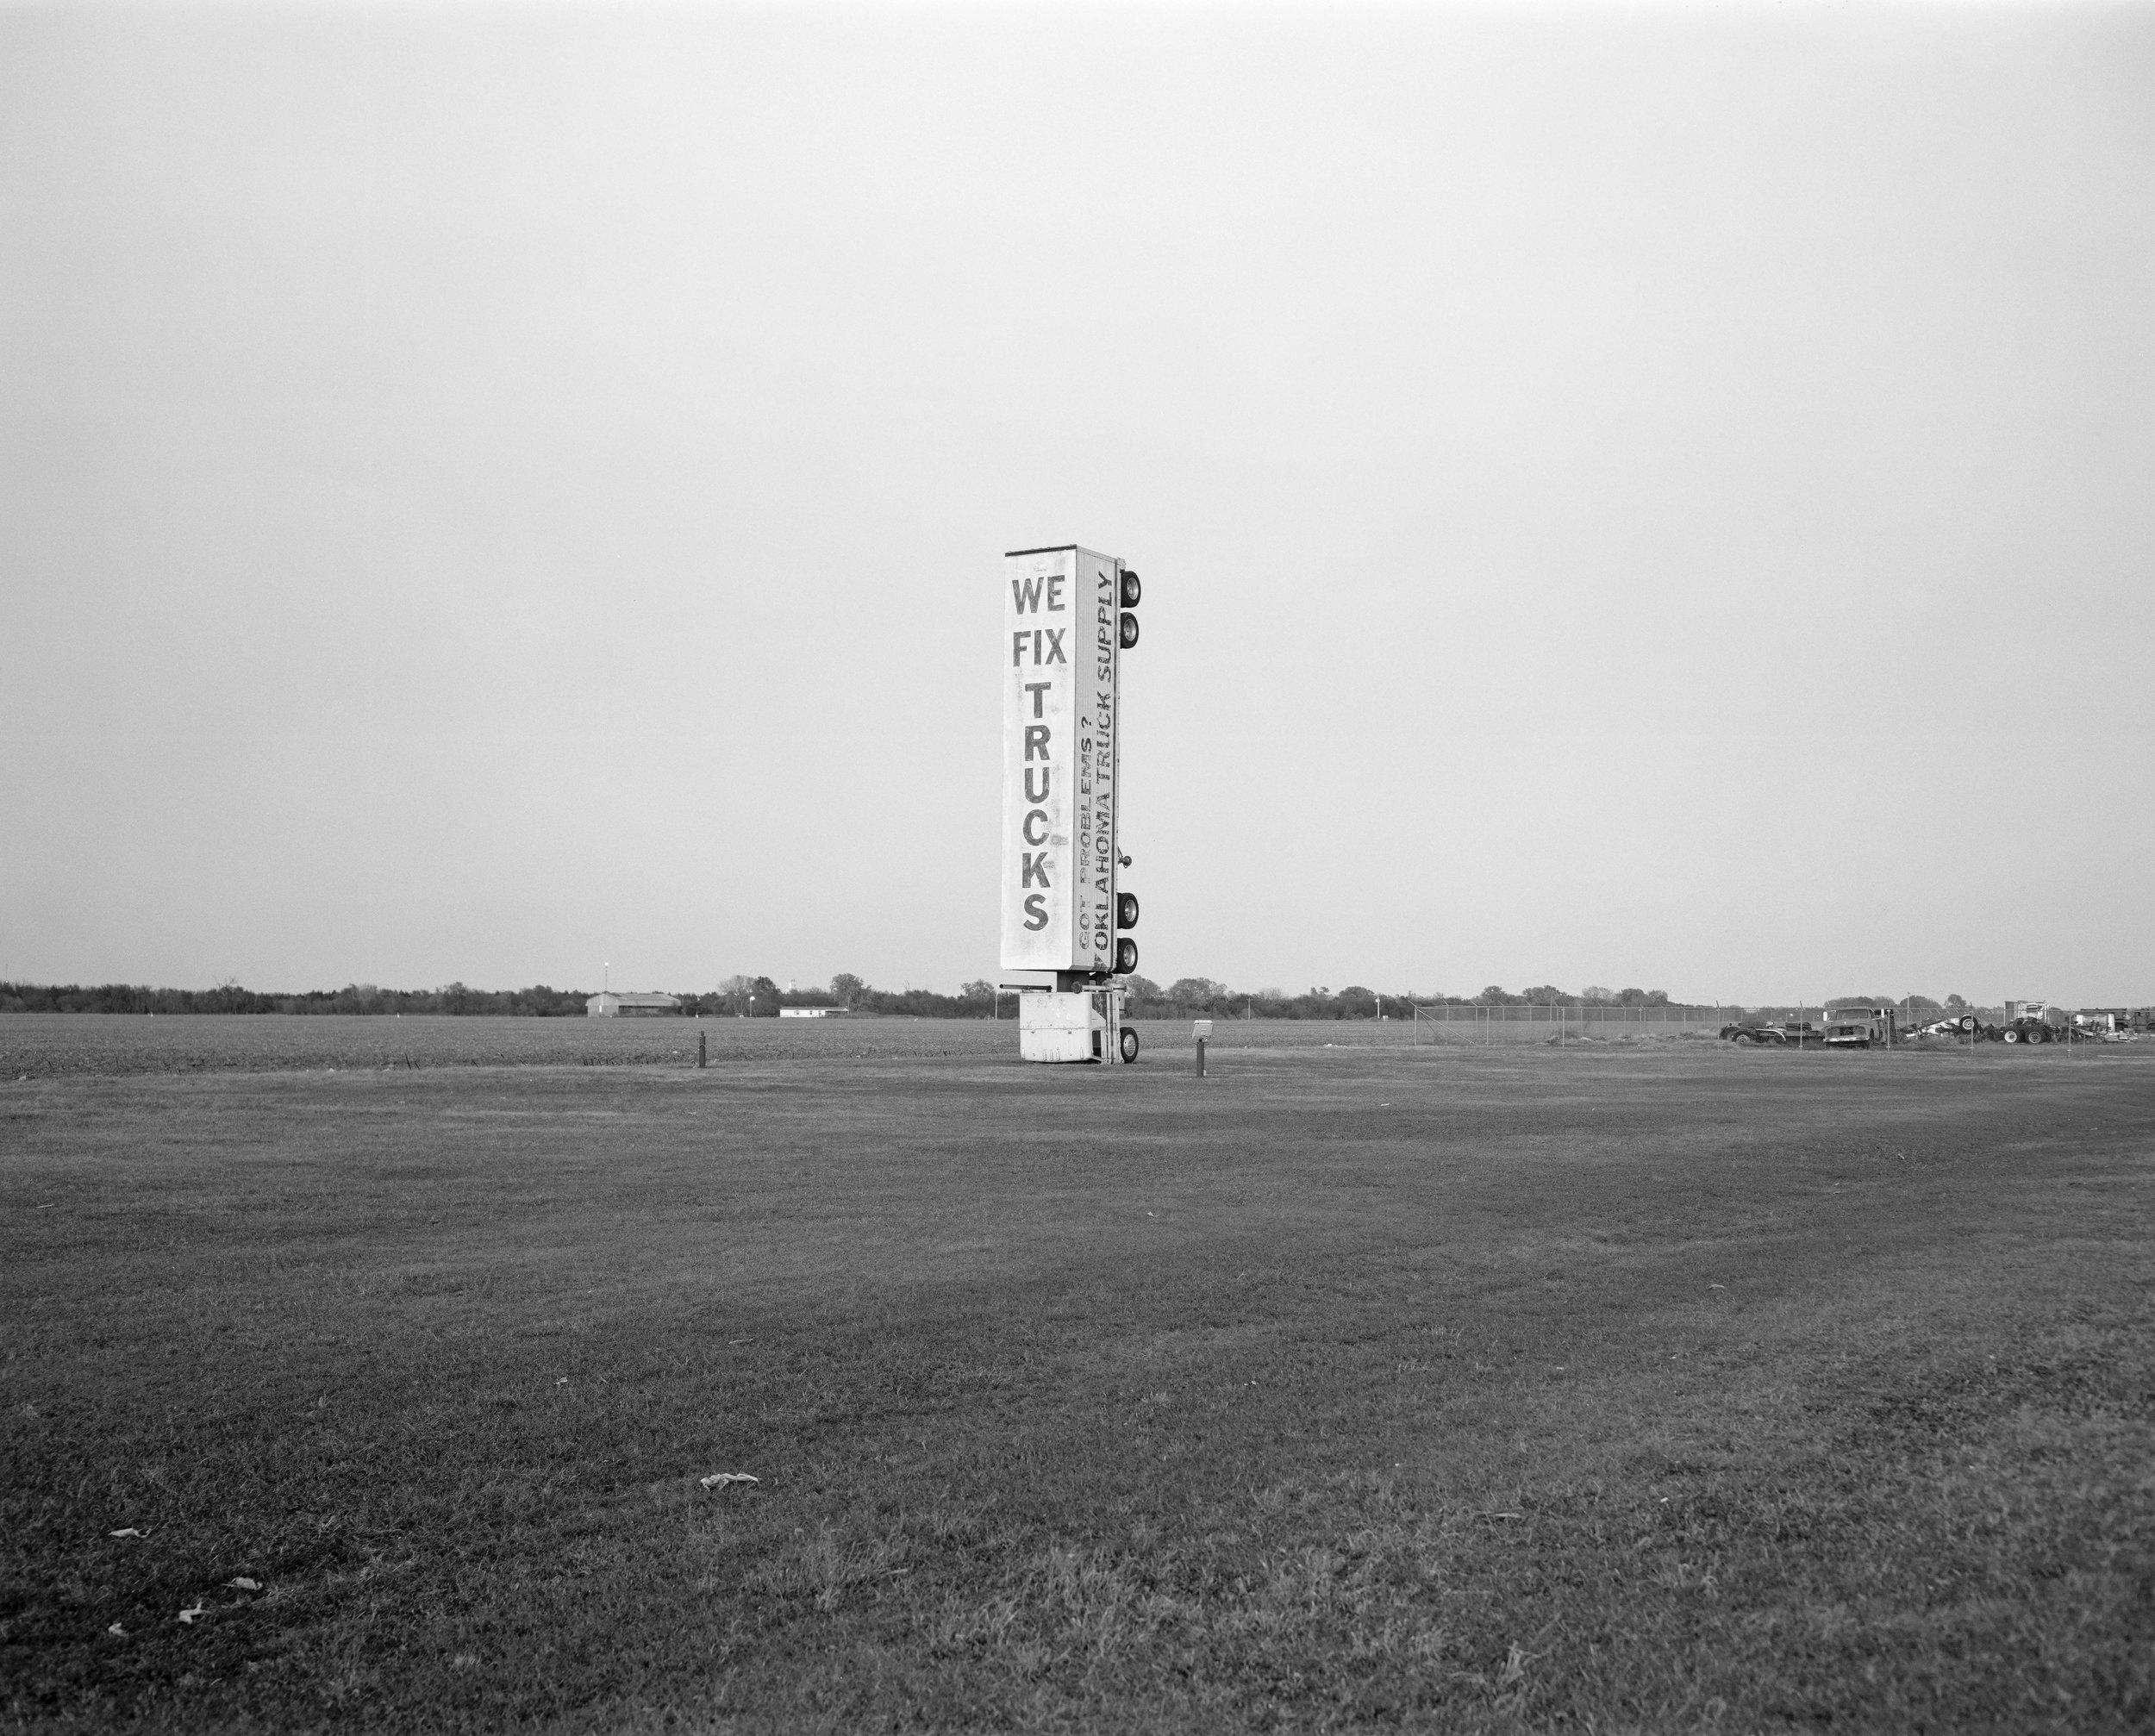 Tonkawa, Oklahoma, 2018 - 4x5 TMAX 100